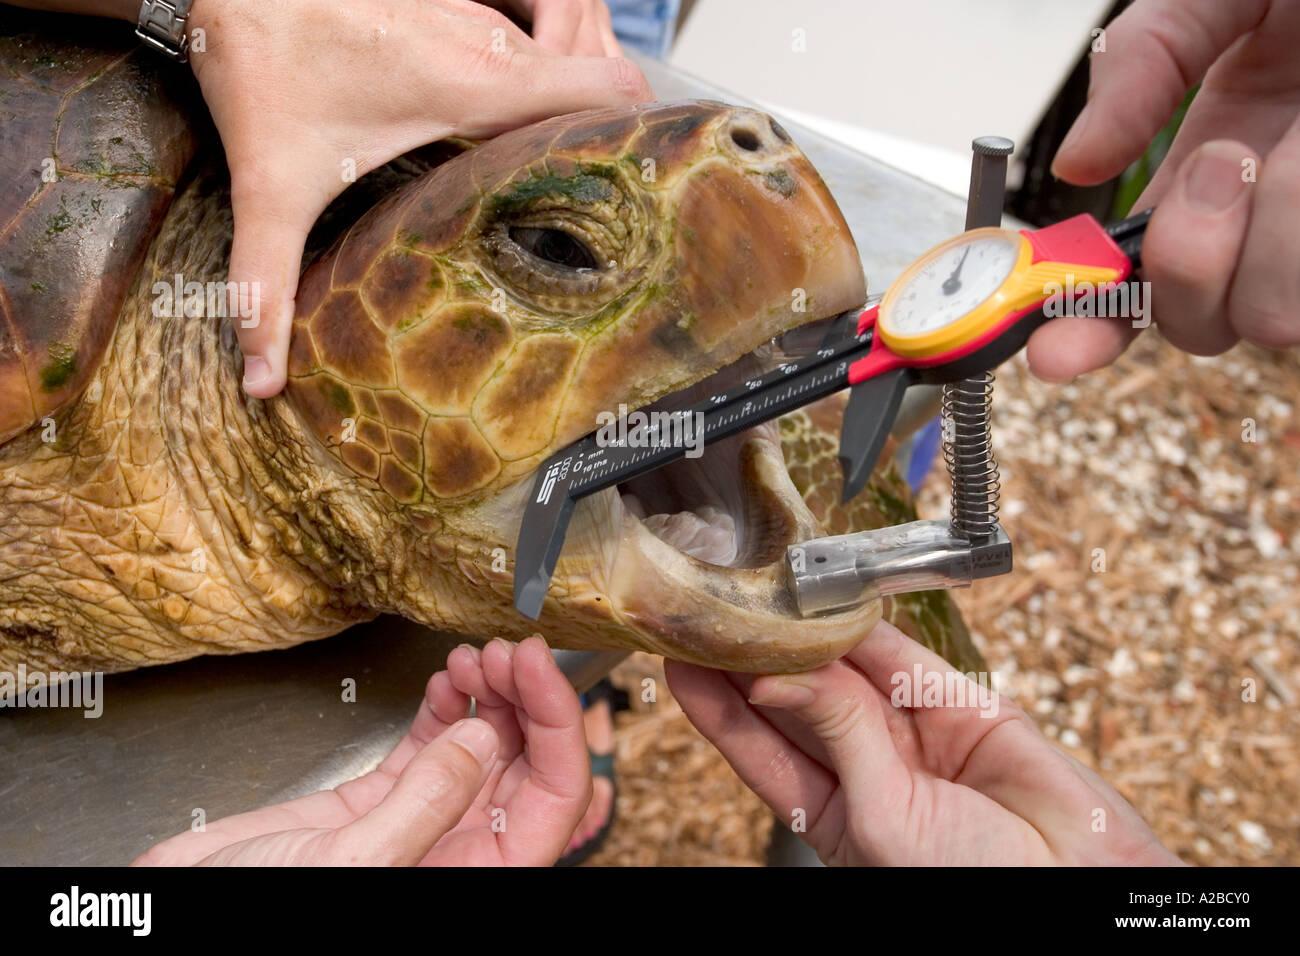 Removing longline fish hook from loggerhead sea turtle (Caretta caretta) using canine mouth gag. - Stock Image